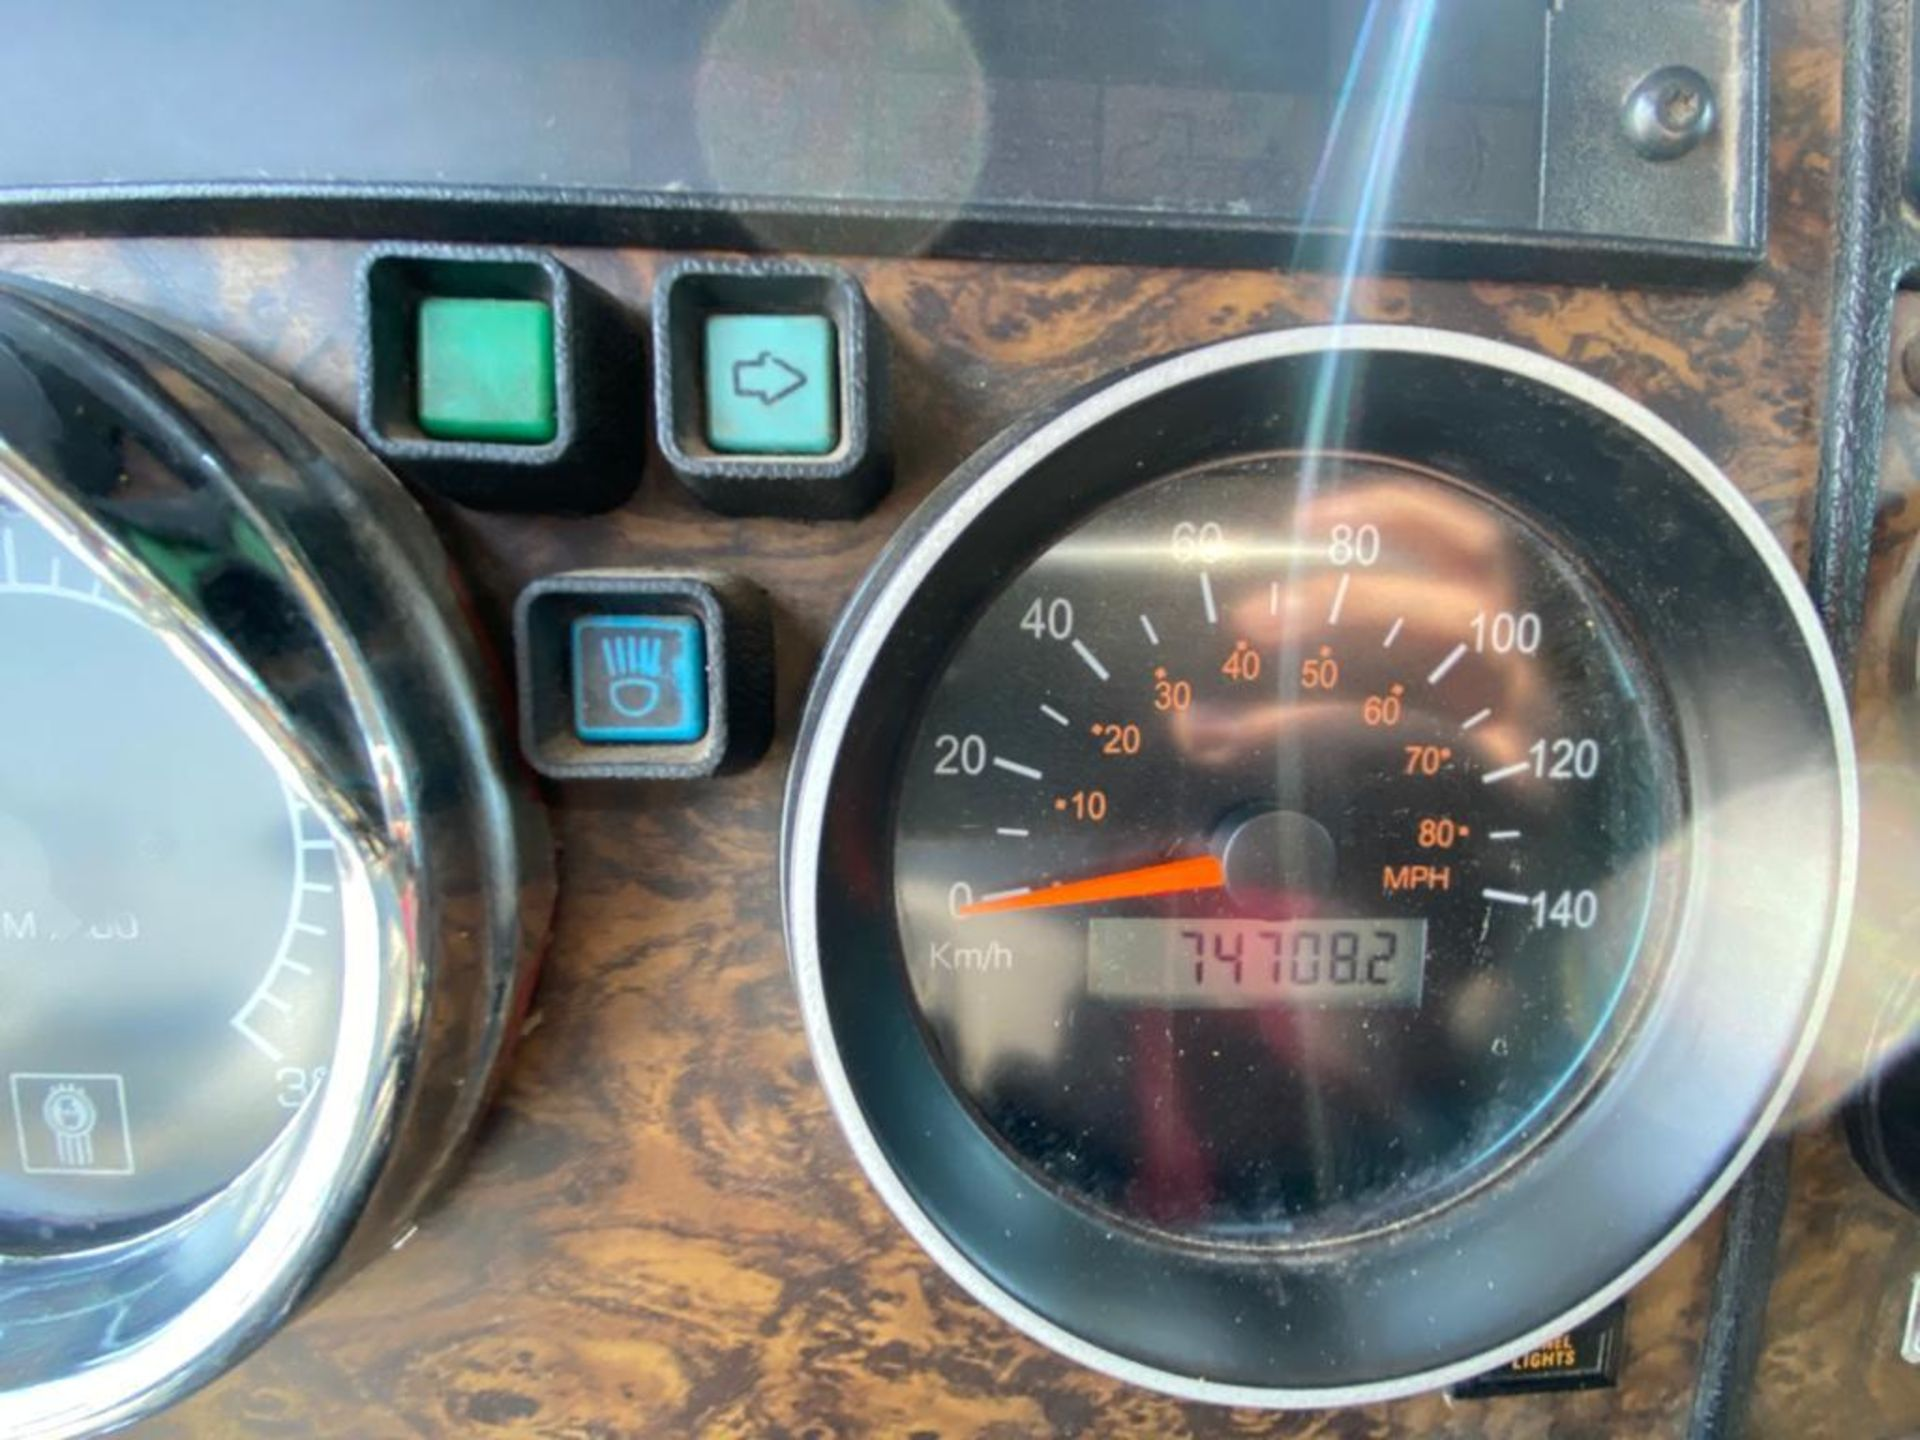 1999 Kenworth Sleeper truck tractor, standard transmission of 18 speeds - Image 41 of 72